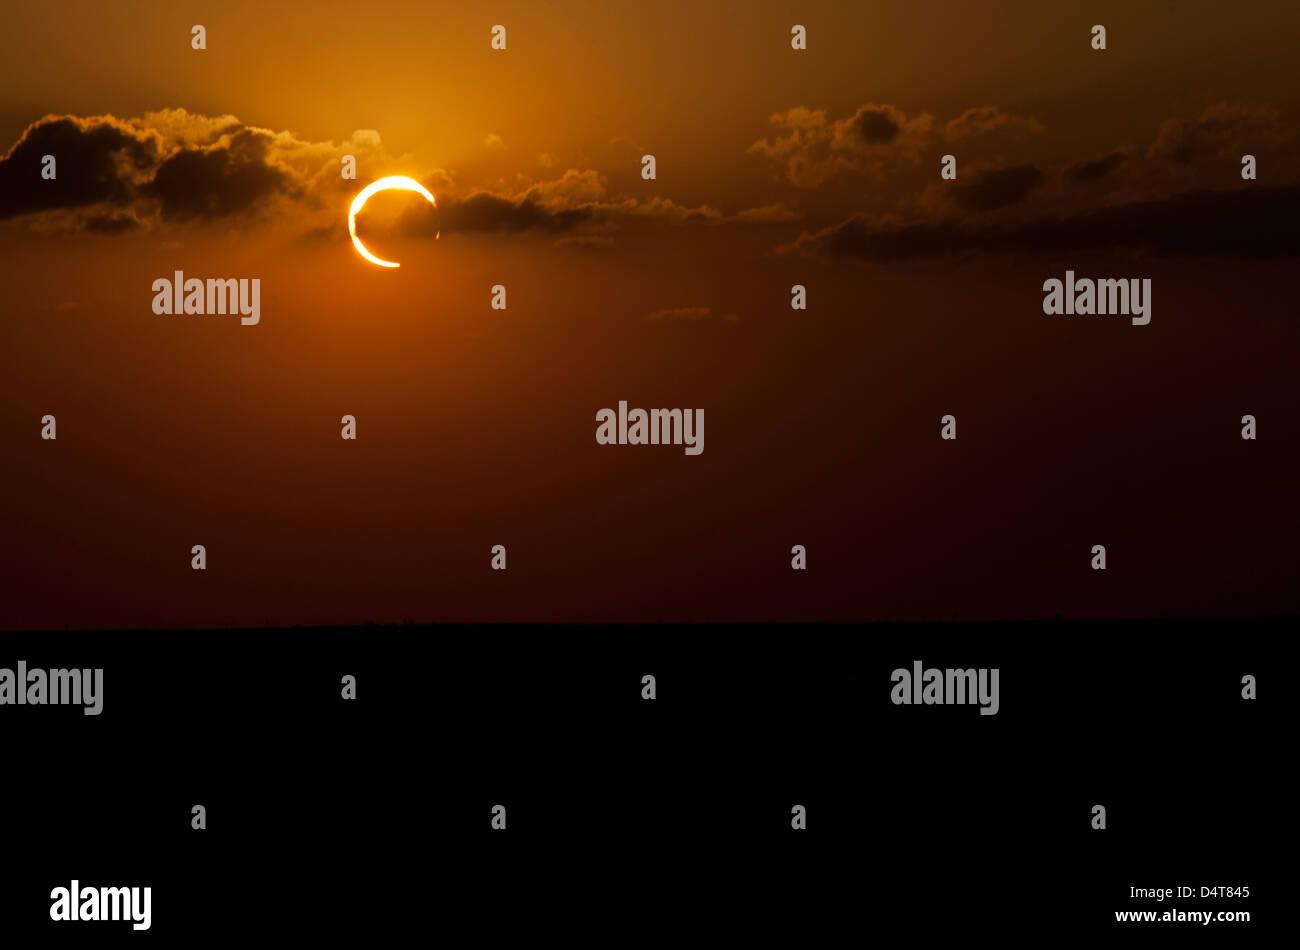 Ringförmige Sonnenfinsternis des Jahres 2012. Stockbild